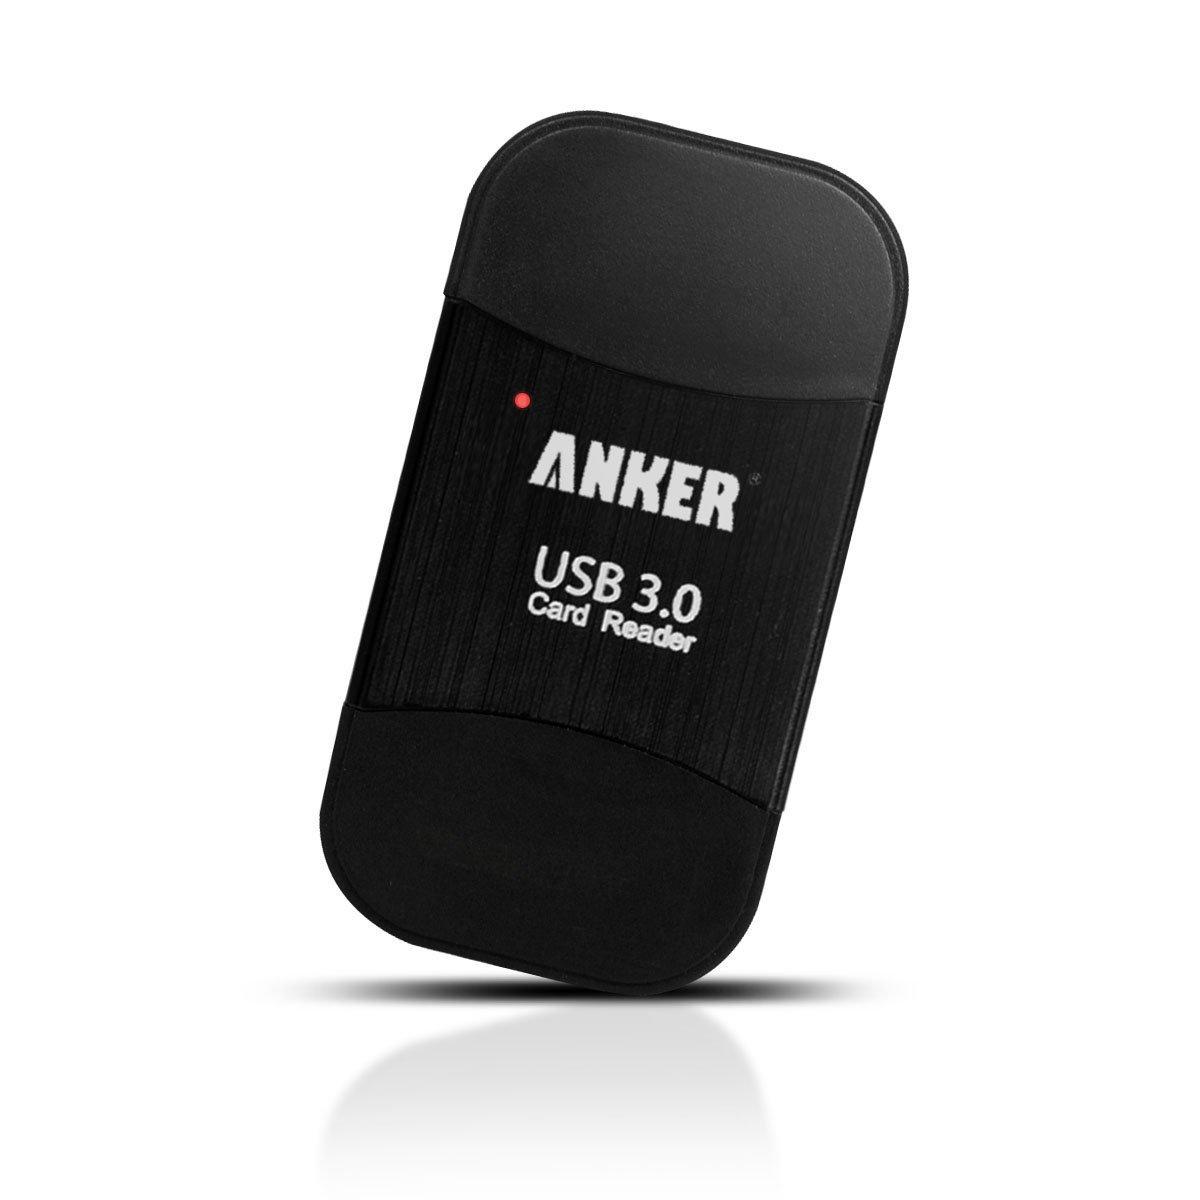 Anker USB 3.0 Multi Purpose Card Reader